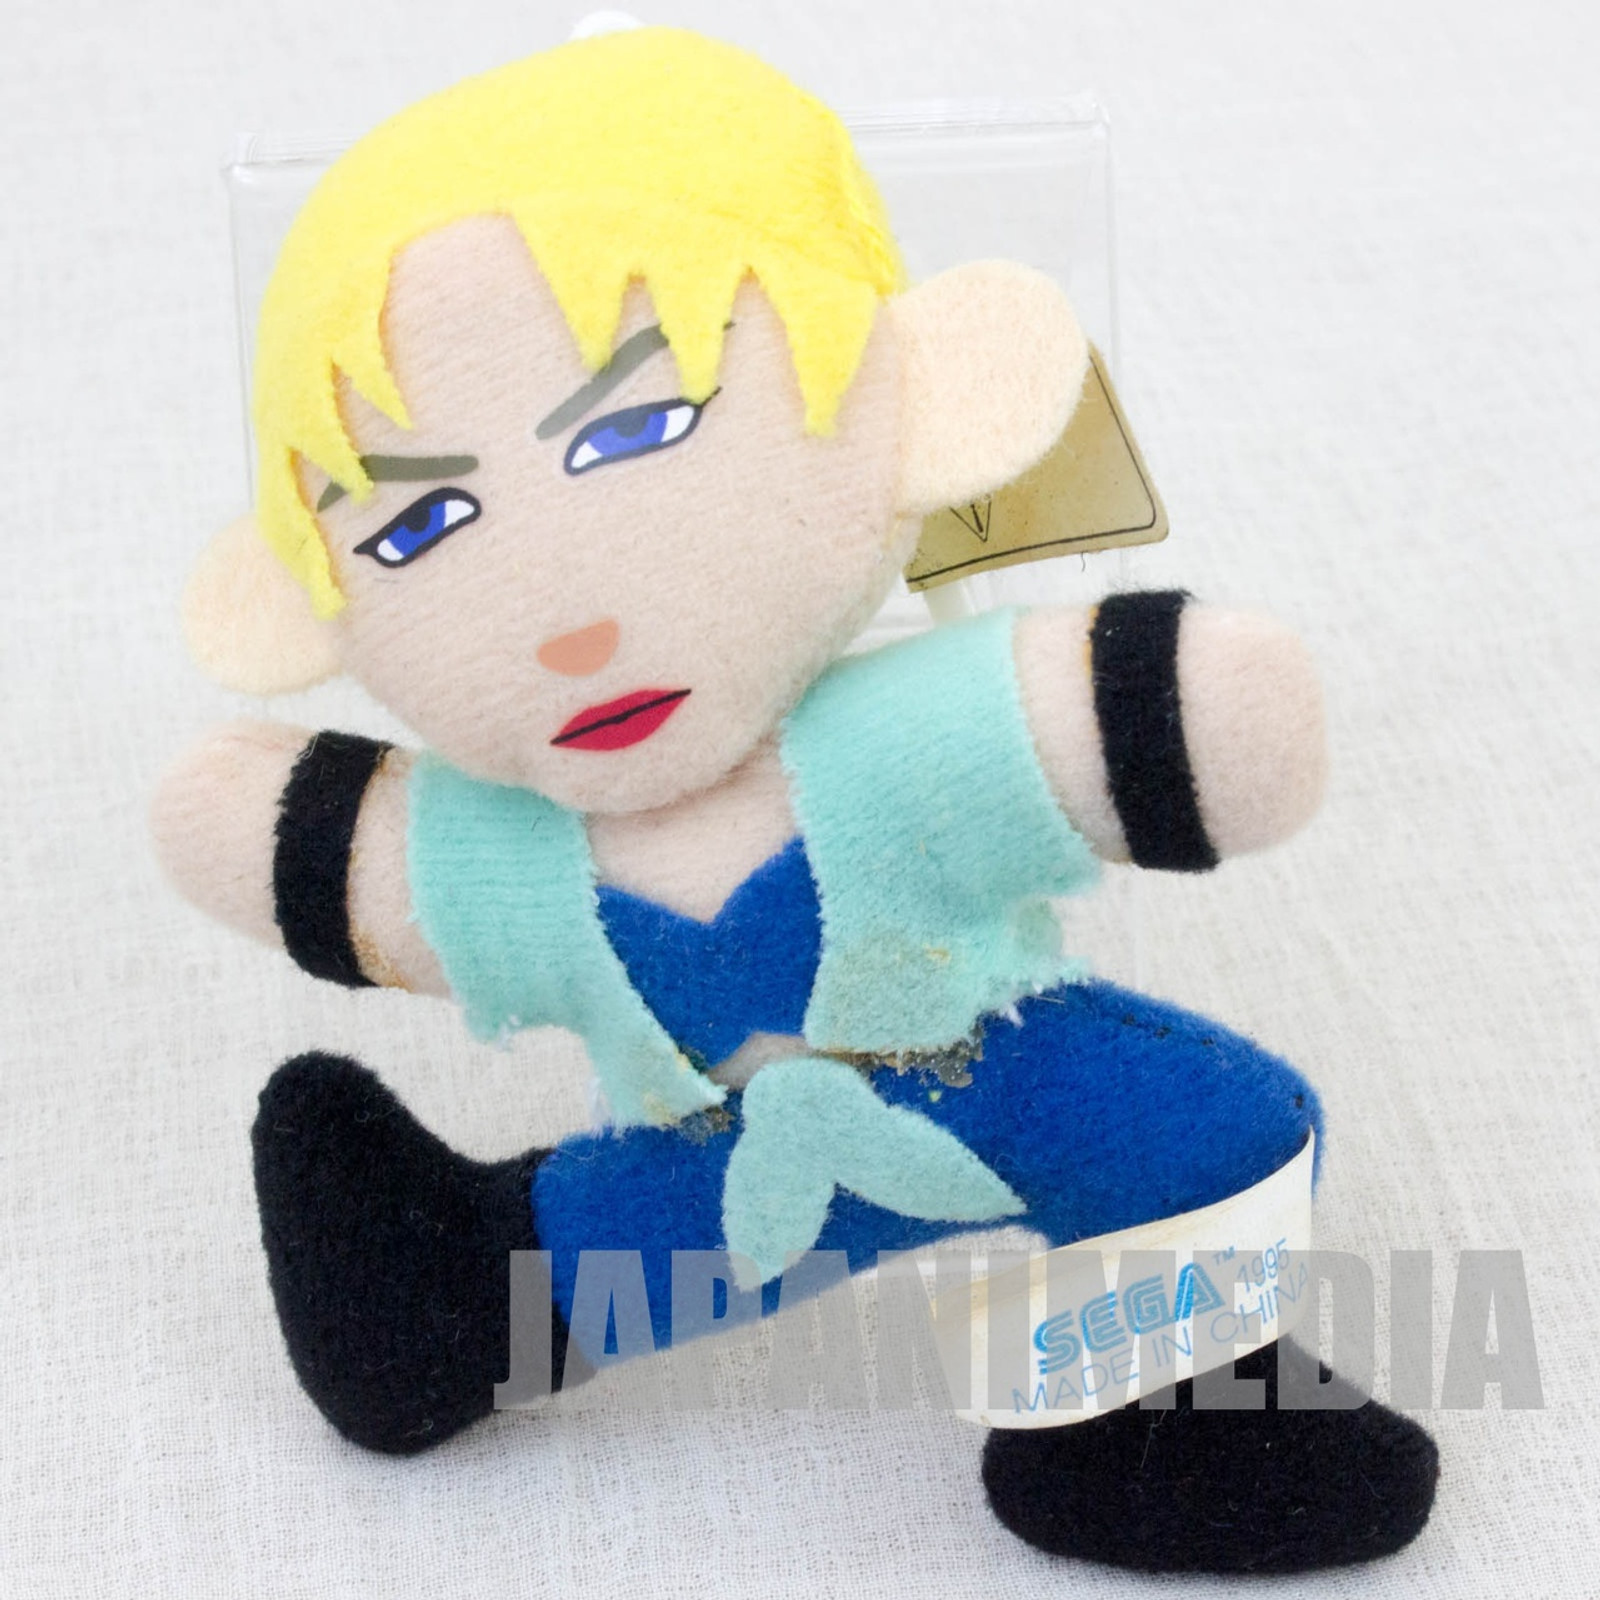 "Virtua Fighter 2 Sarah Bryant 3.5"" Mini Plush Doll SEGA 1995 JAPAN GAME 2"